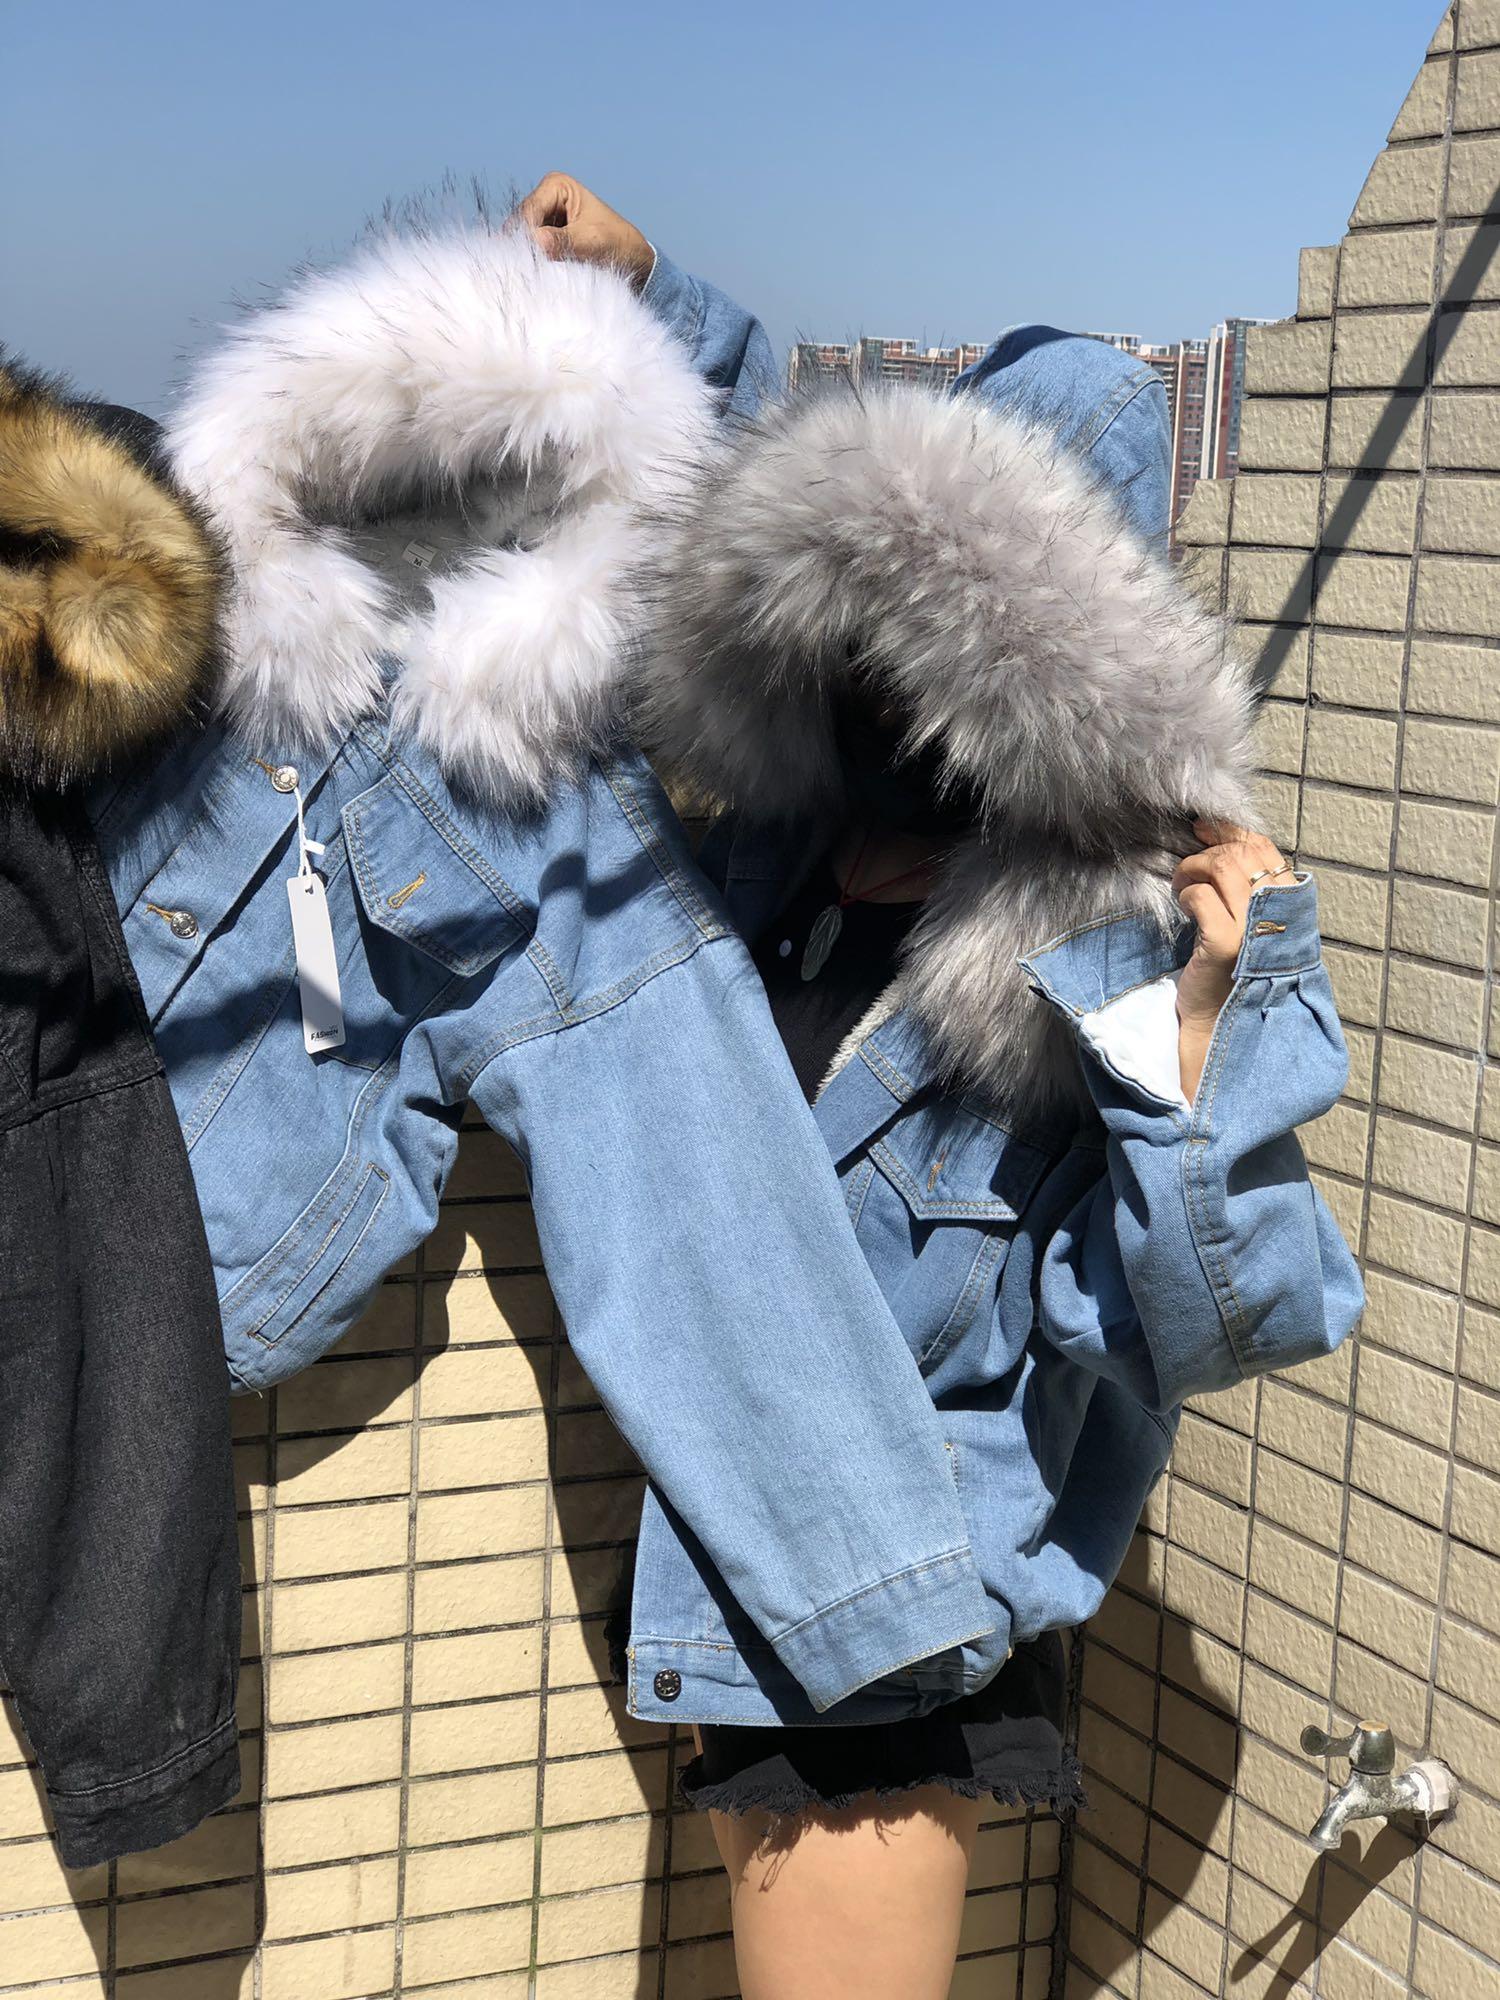 H0ec8f335febe4f438f160073642f546fm LUZUZI 2019 New Warm Winter Bomber Women Winter Autumn Hooded Girls Coat Jeans Denim Jackets Basic Ladies Top Windbreaker Female